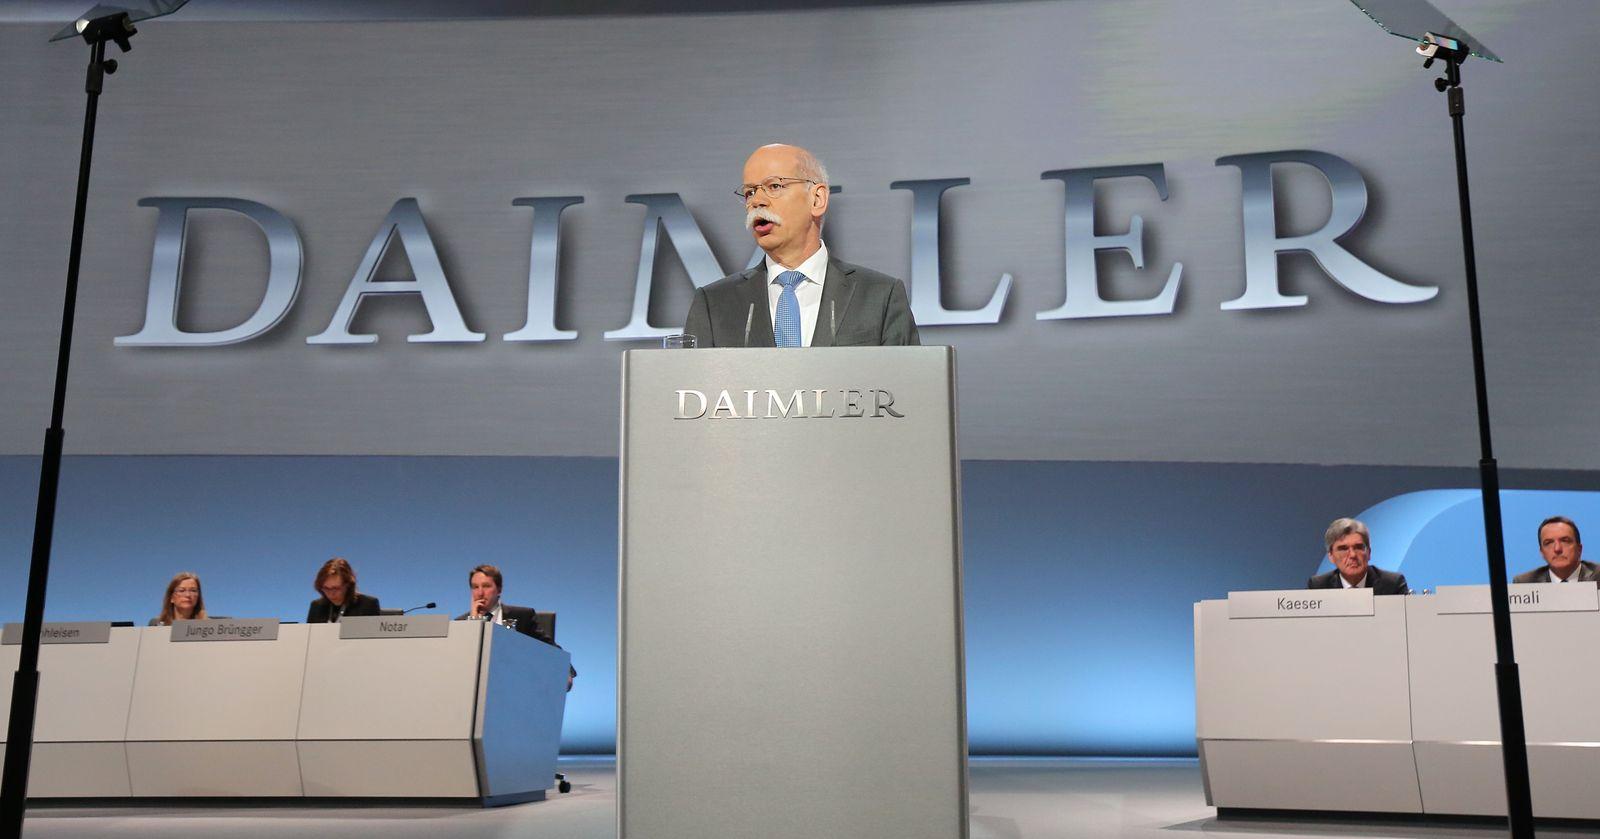 Daimler Hauptversammlumg